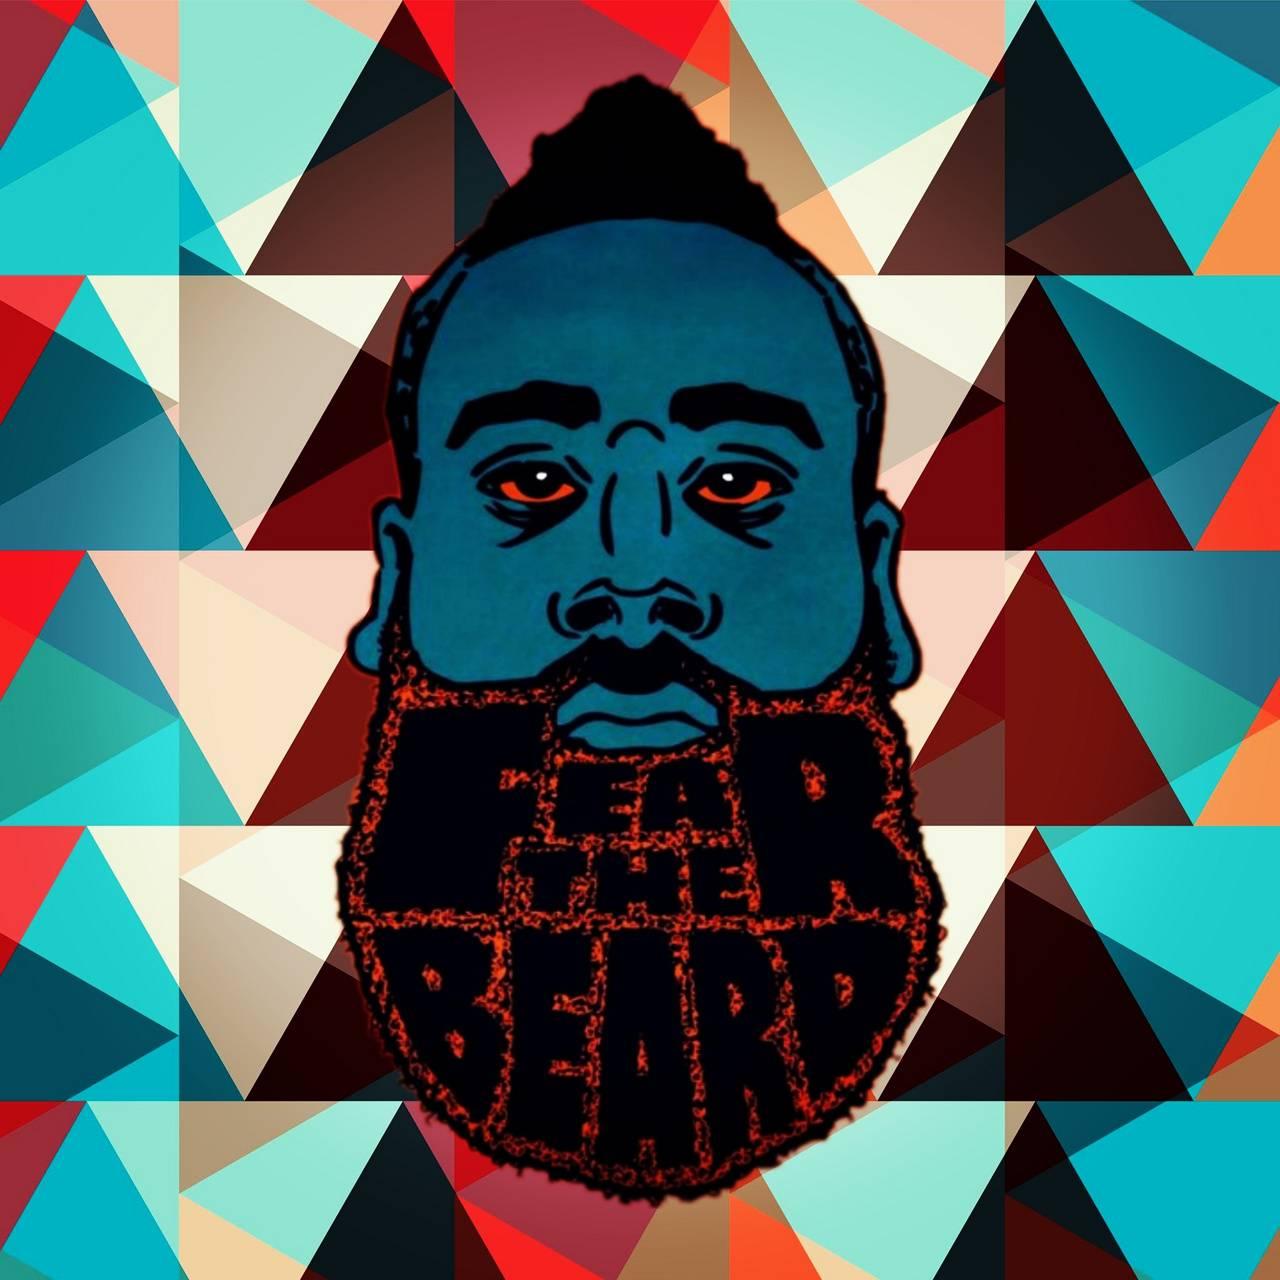 Fear The Beard Wallpaper By Culturalcouple 43 Free On Zedge